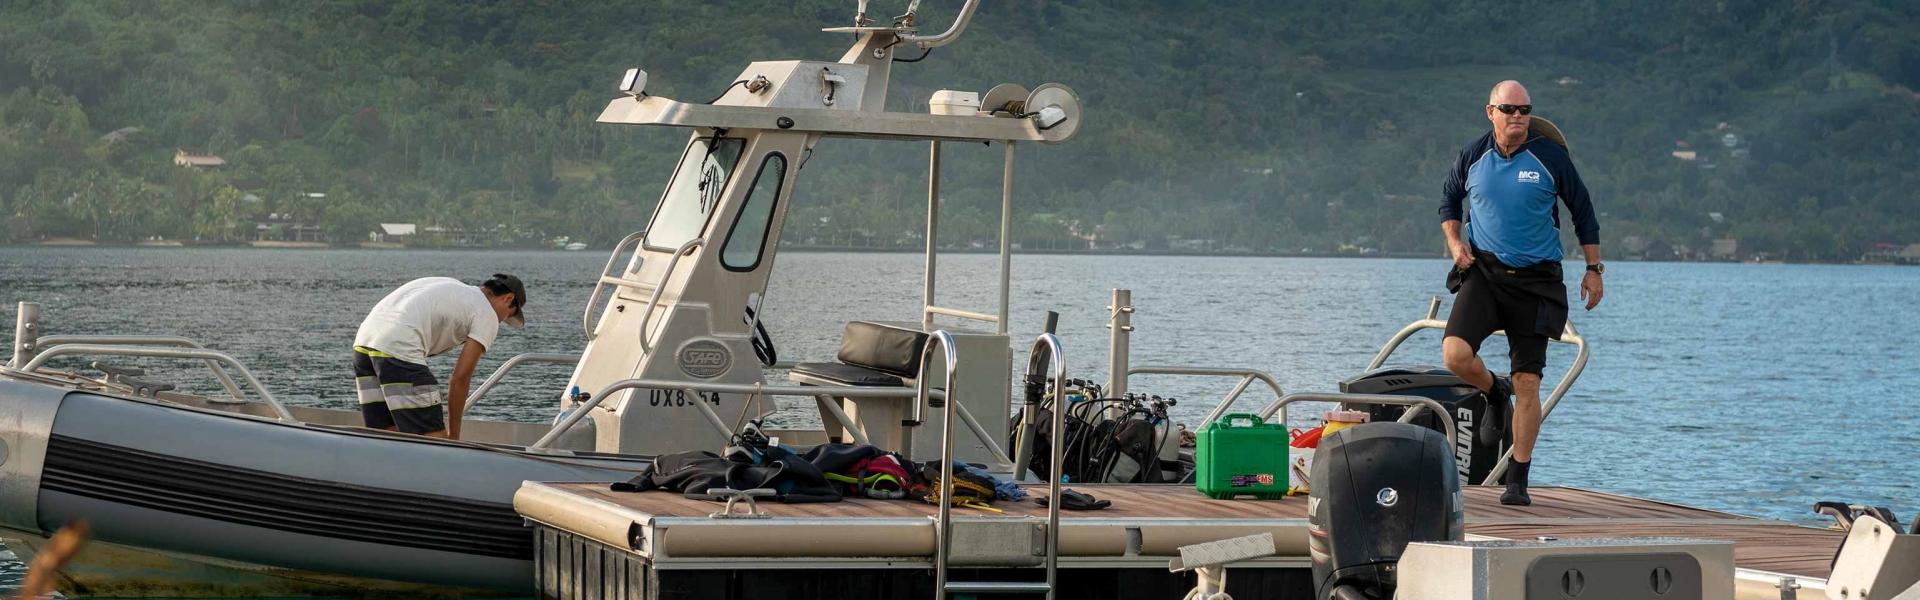 Two men gear up scuba equipment on a boat